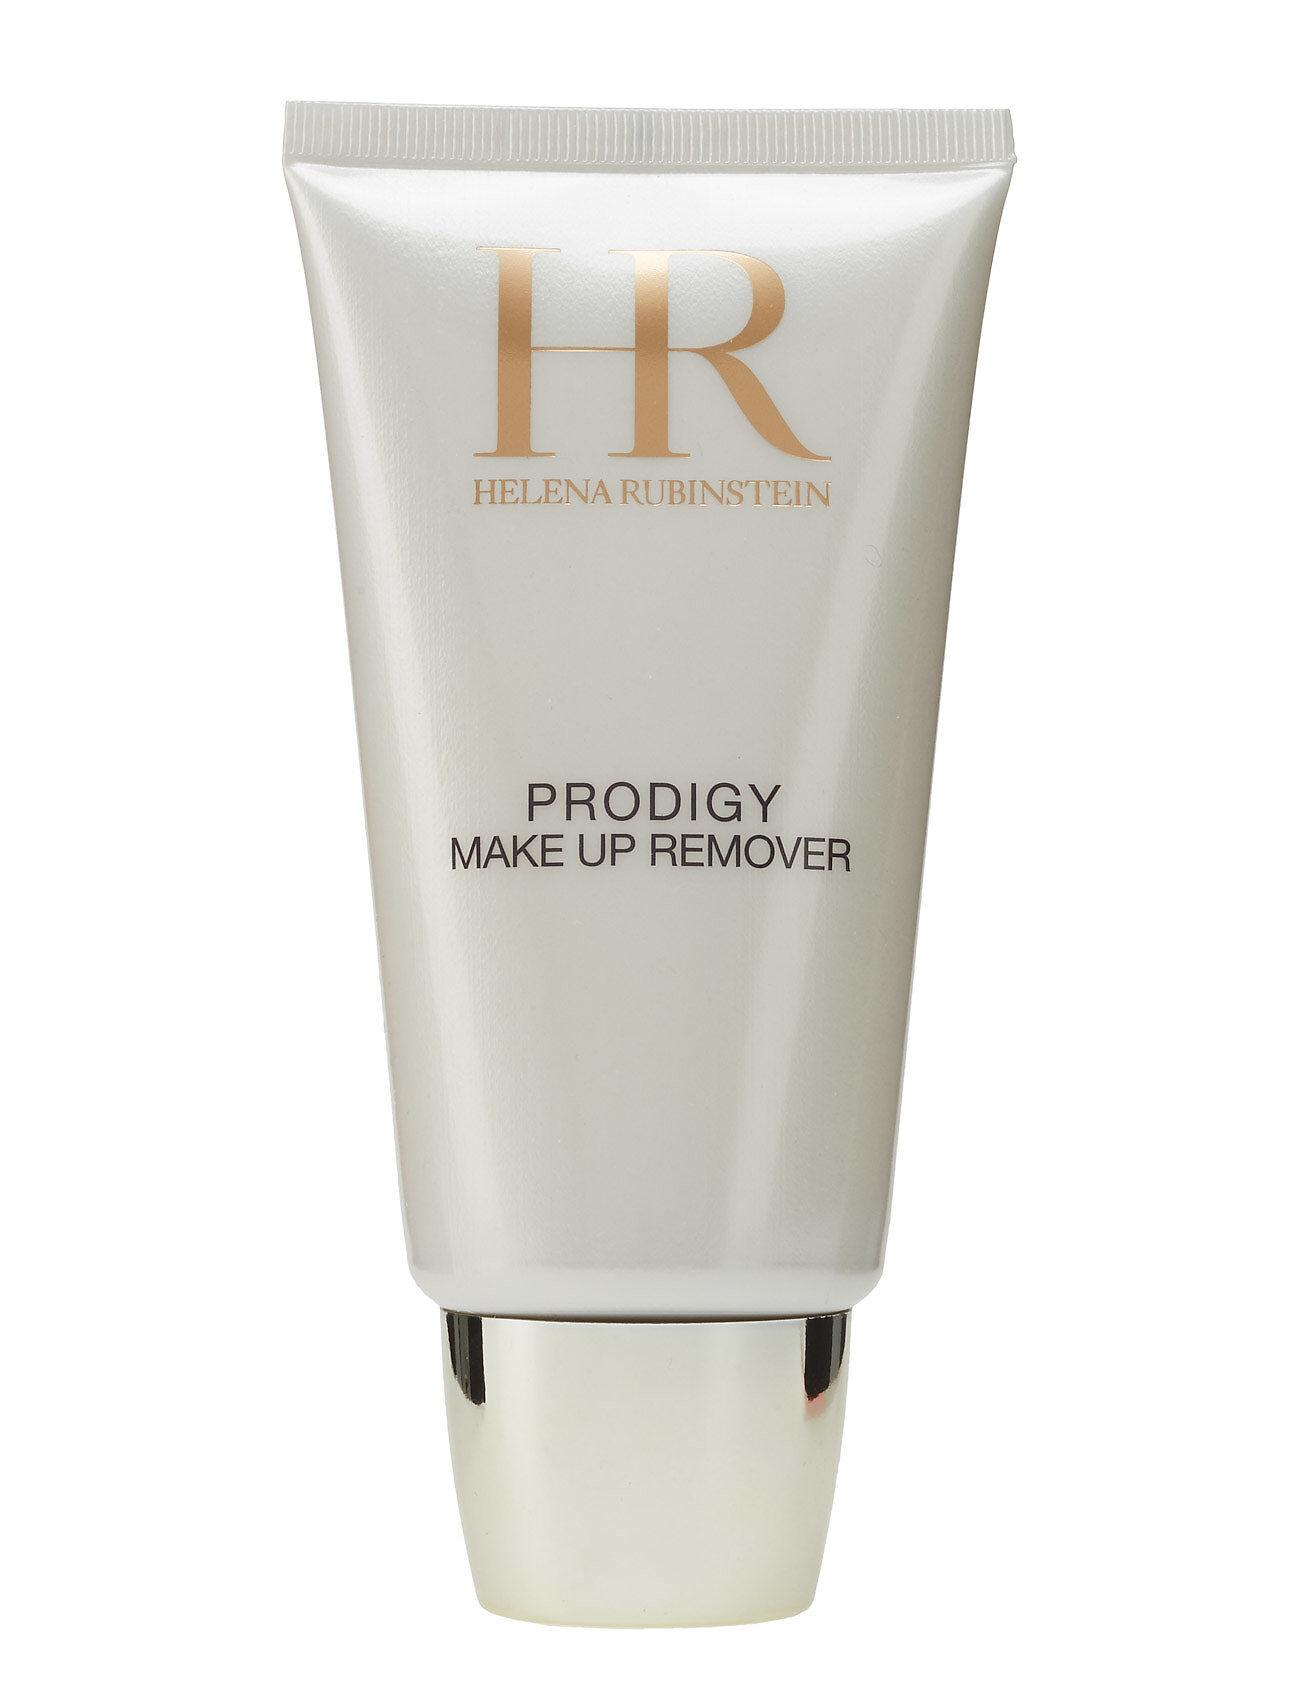 Helena Rubinstein Prodigy Makeup Remover 150 Ml